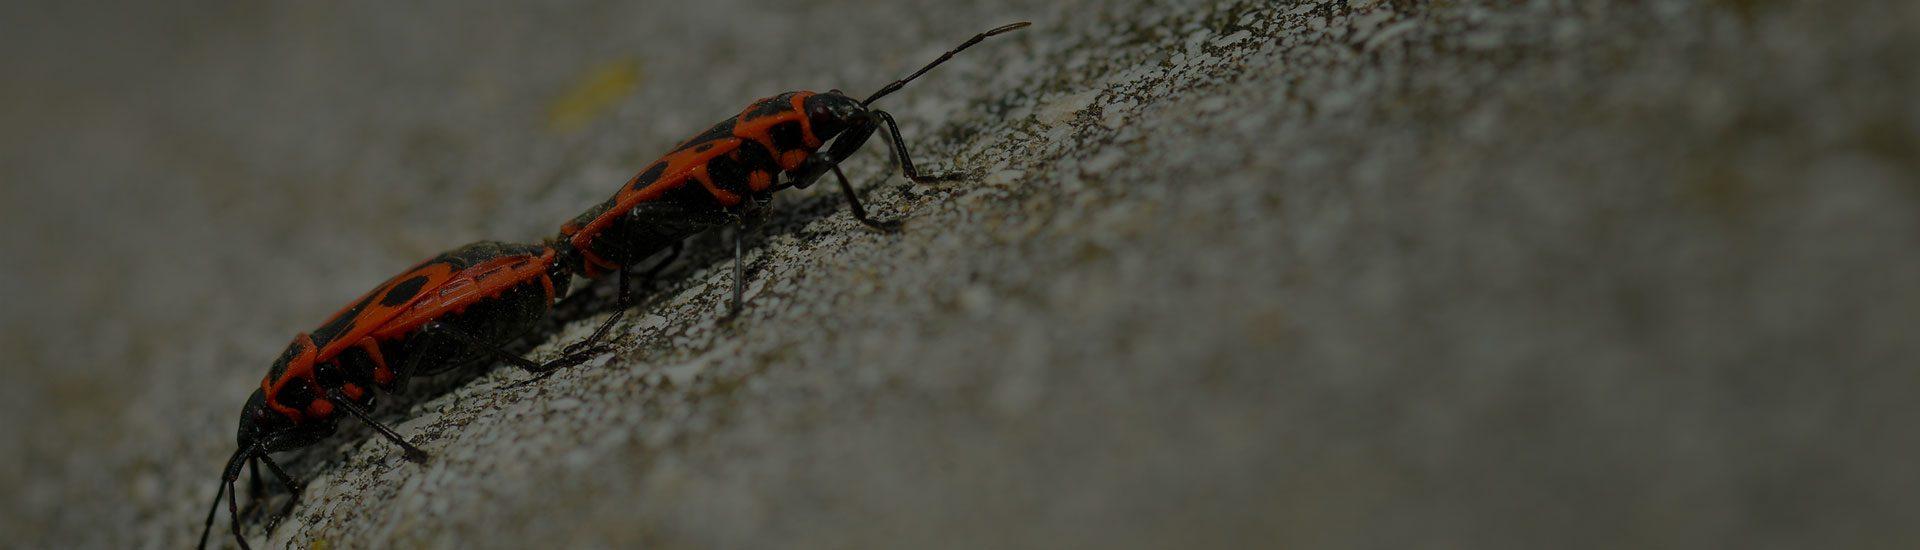 Keeps your home bug free!